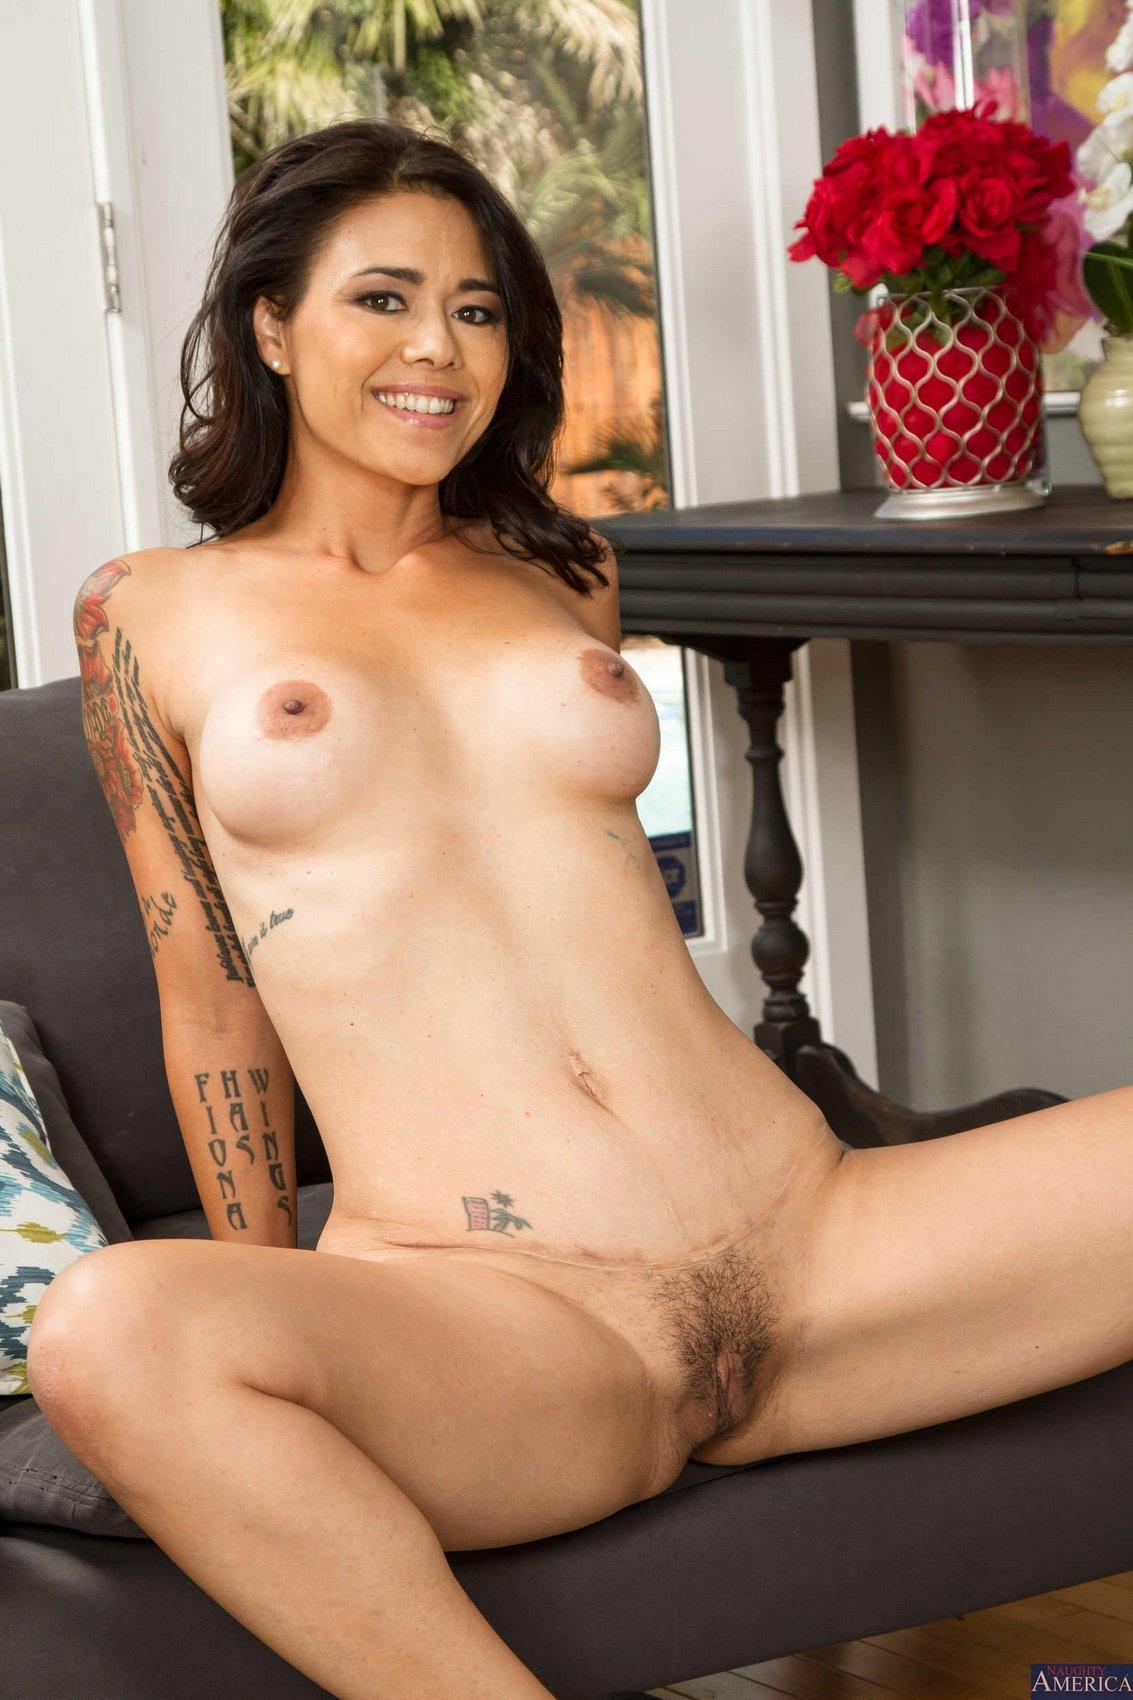 nude photos of justin long